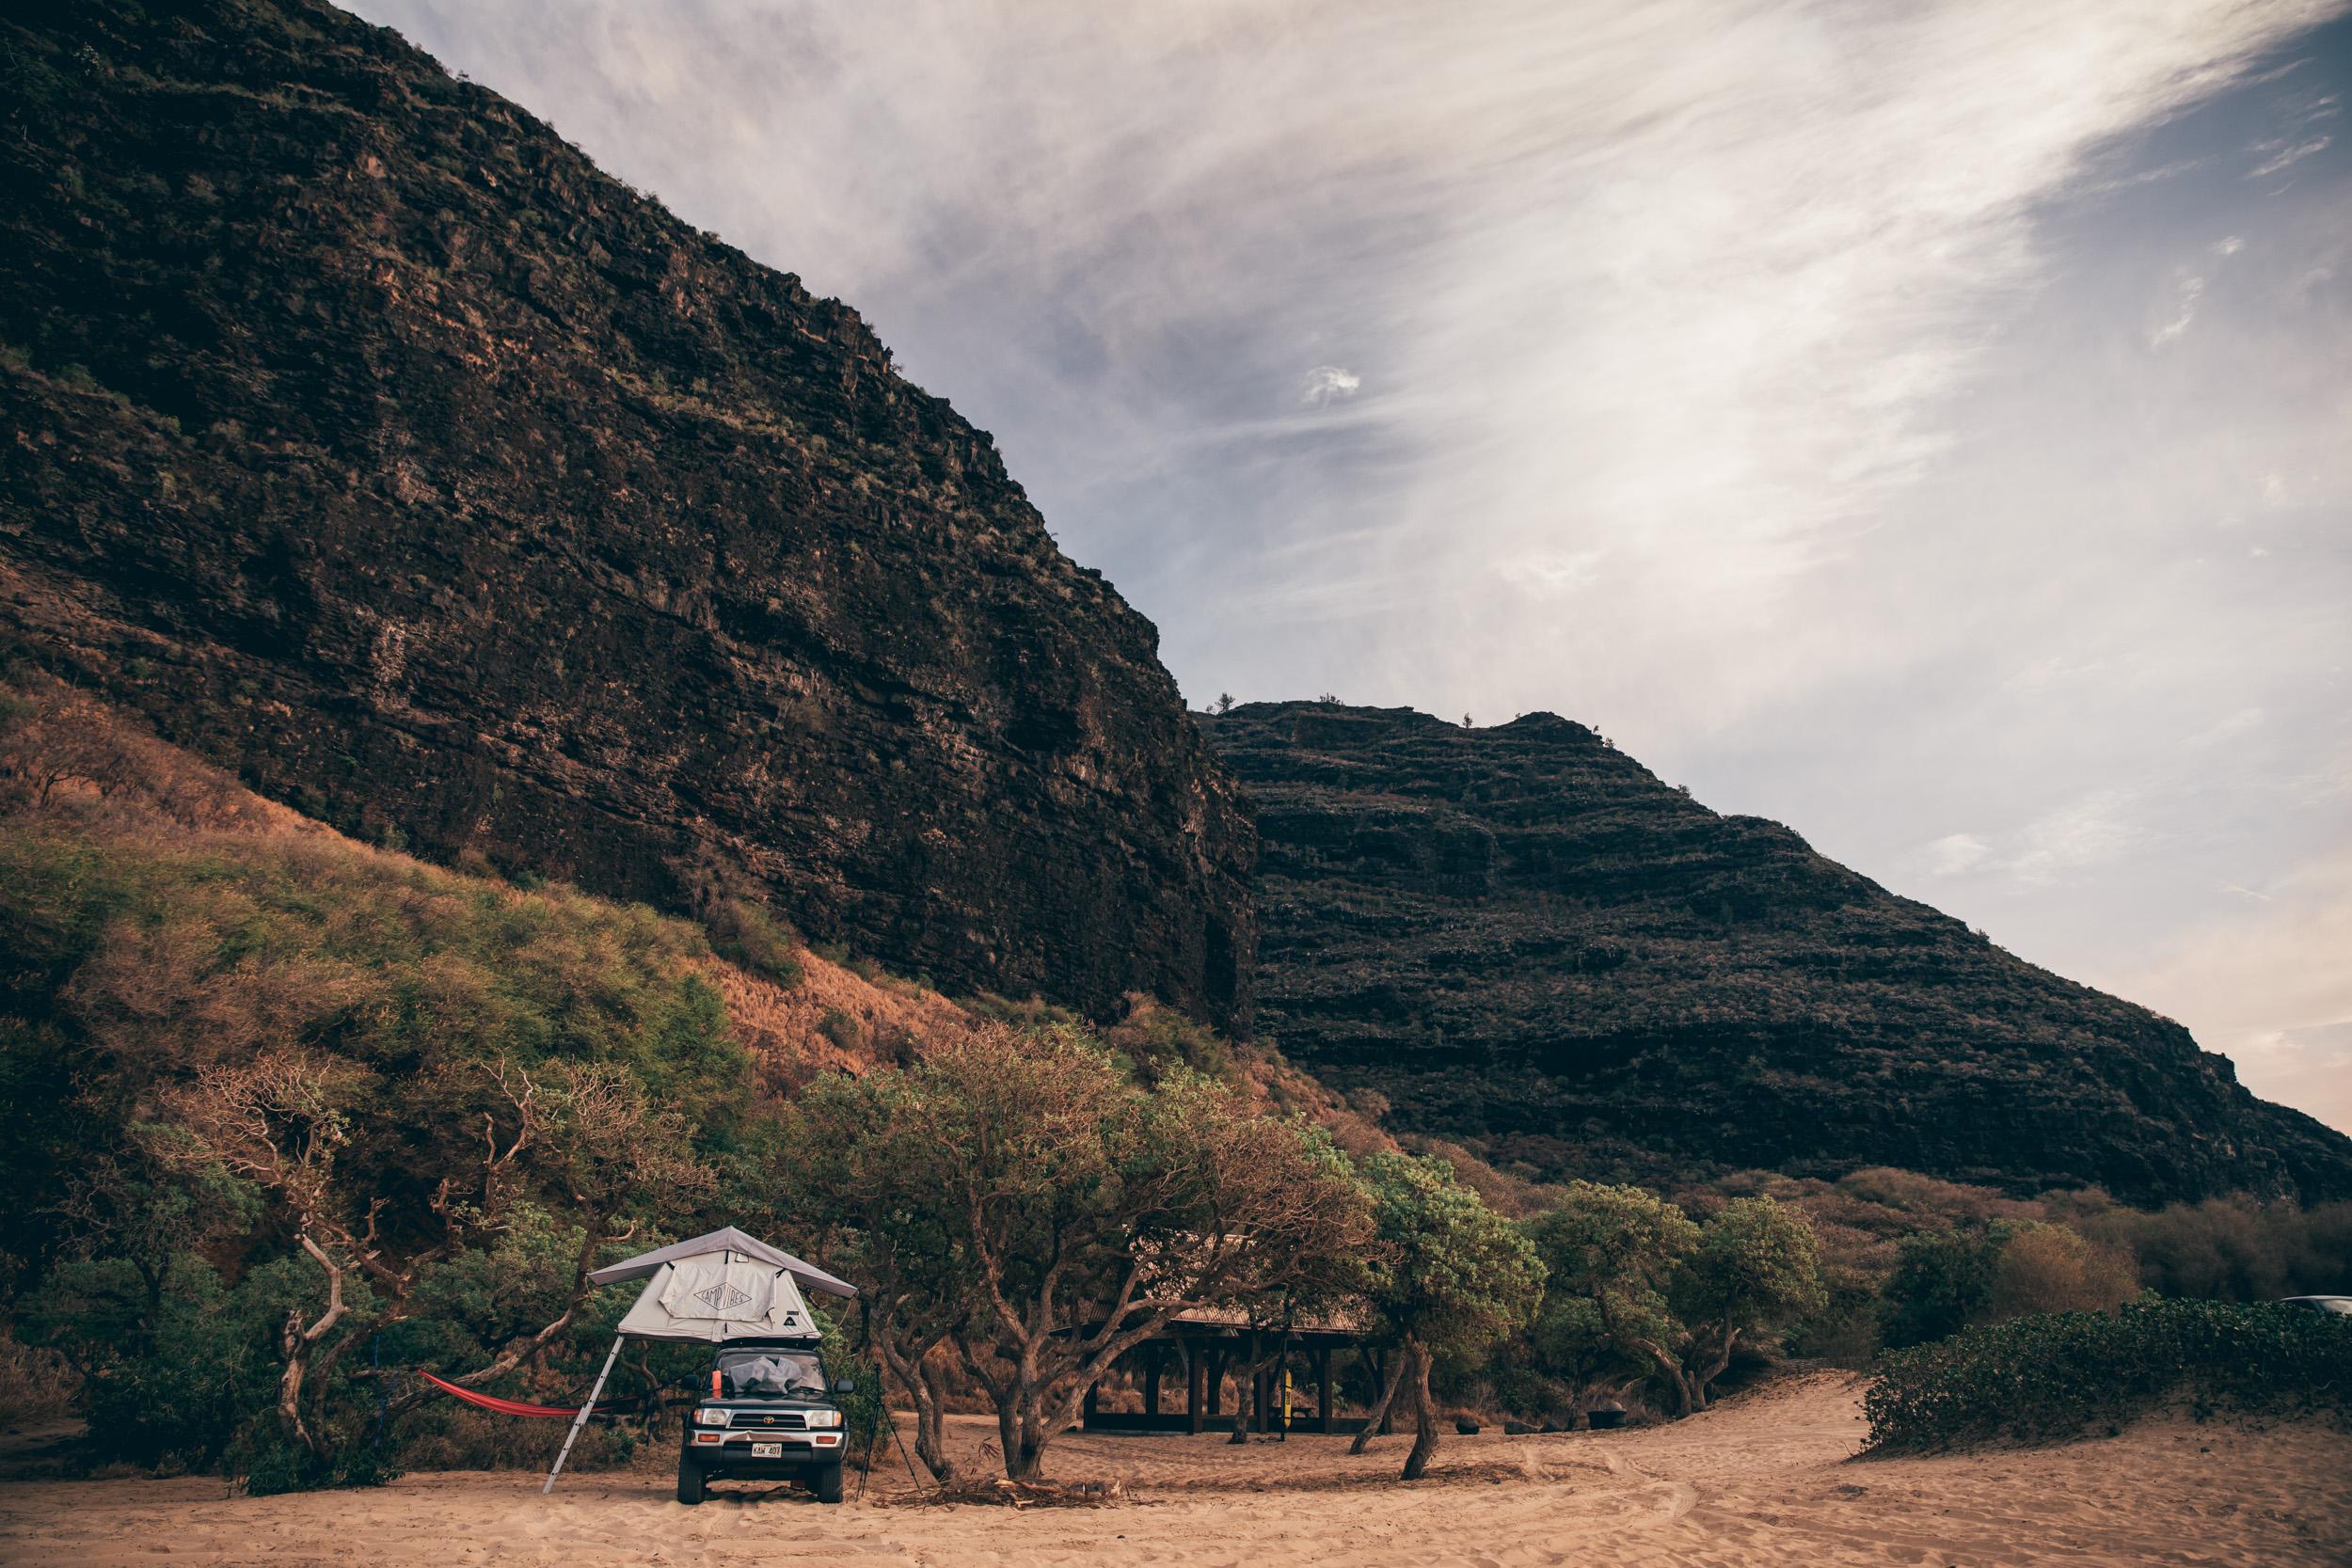 Hawaii-Overland-Kauai-roof top tent-camping-polihale-rental.jpg